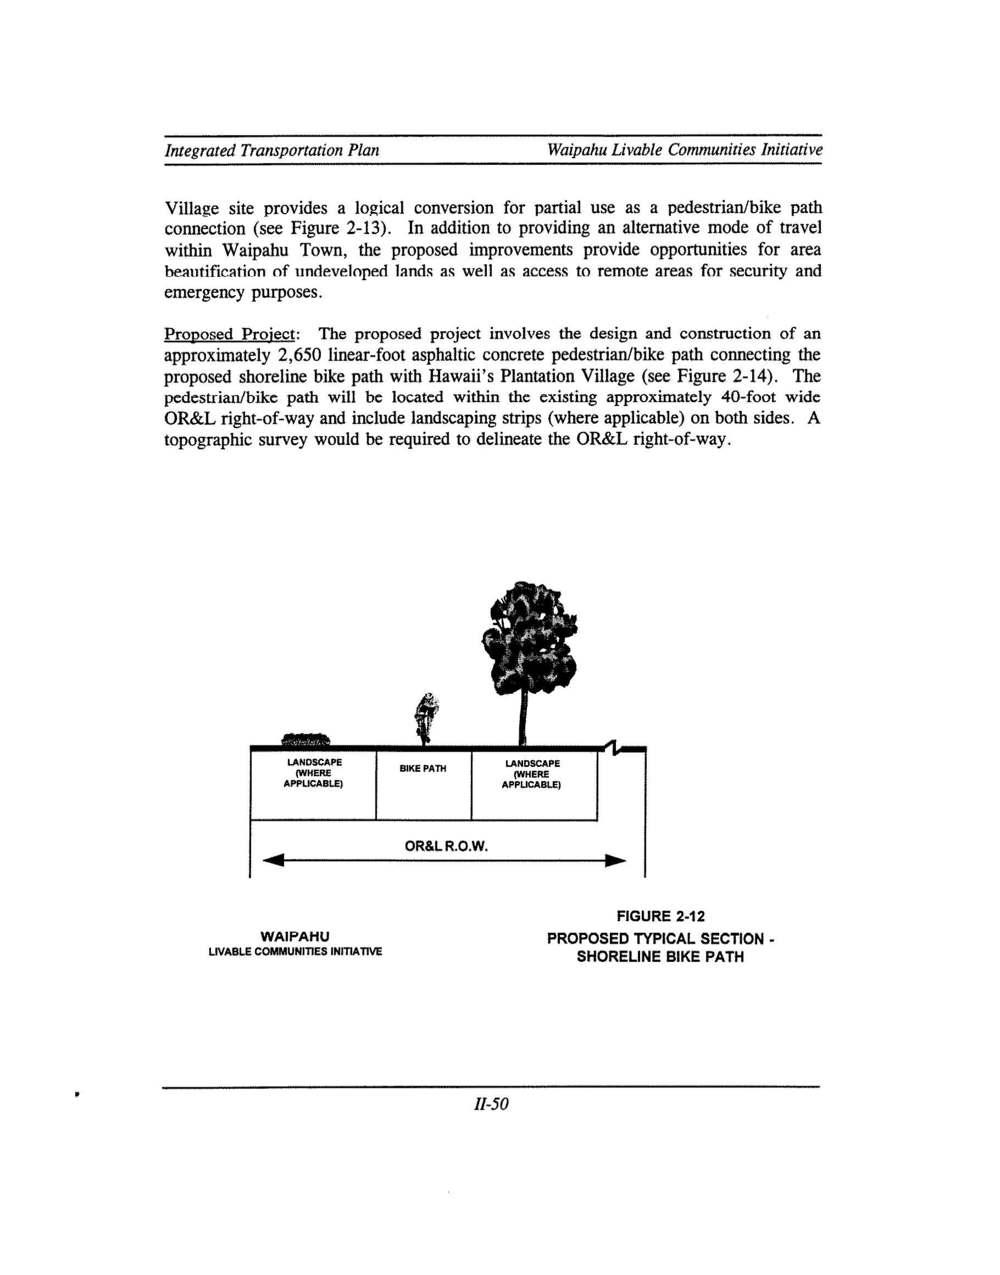 160531_WaipahuLivableCommunities(1998)_Page_065.jpg